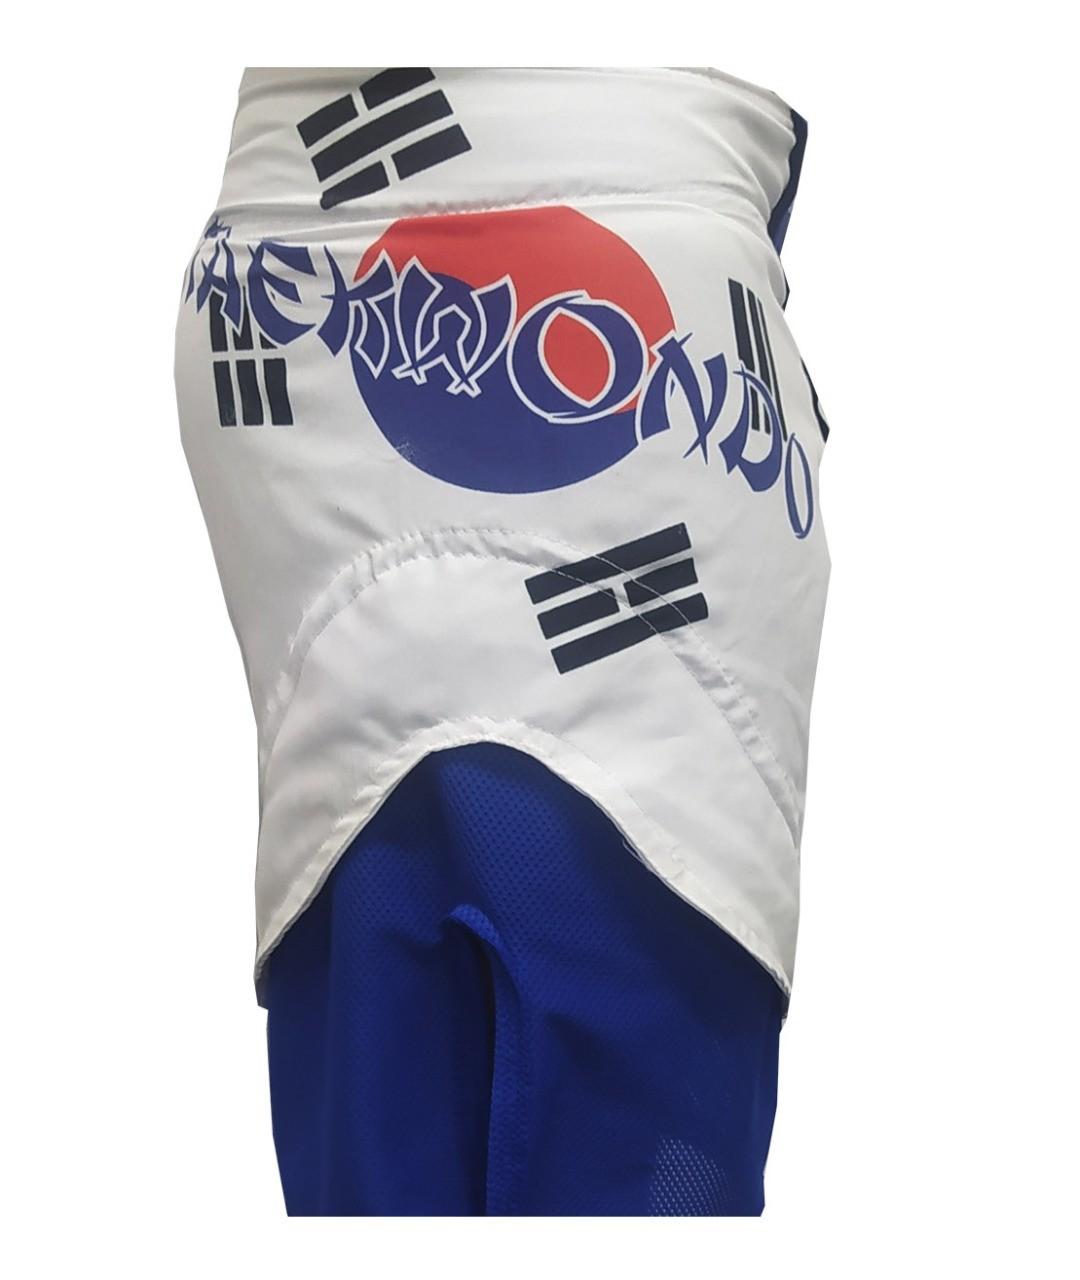 Bermuda MMA - Korean Taekwondo -  Dry 1759-  Branco/Azul -  Dominium -